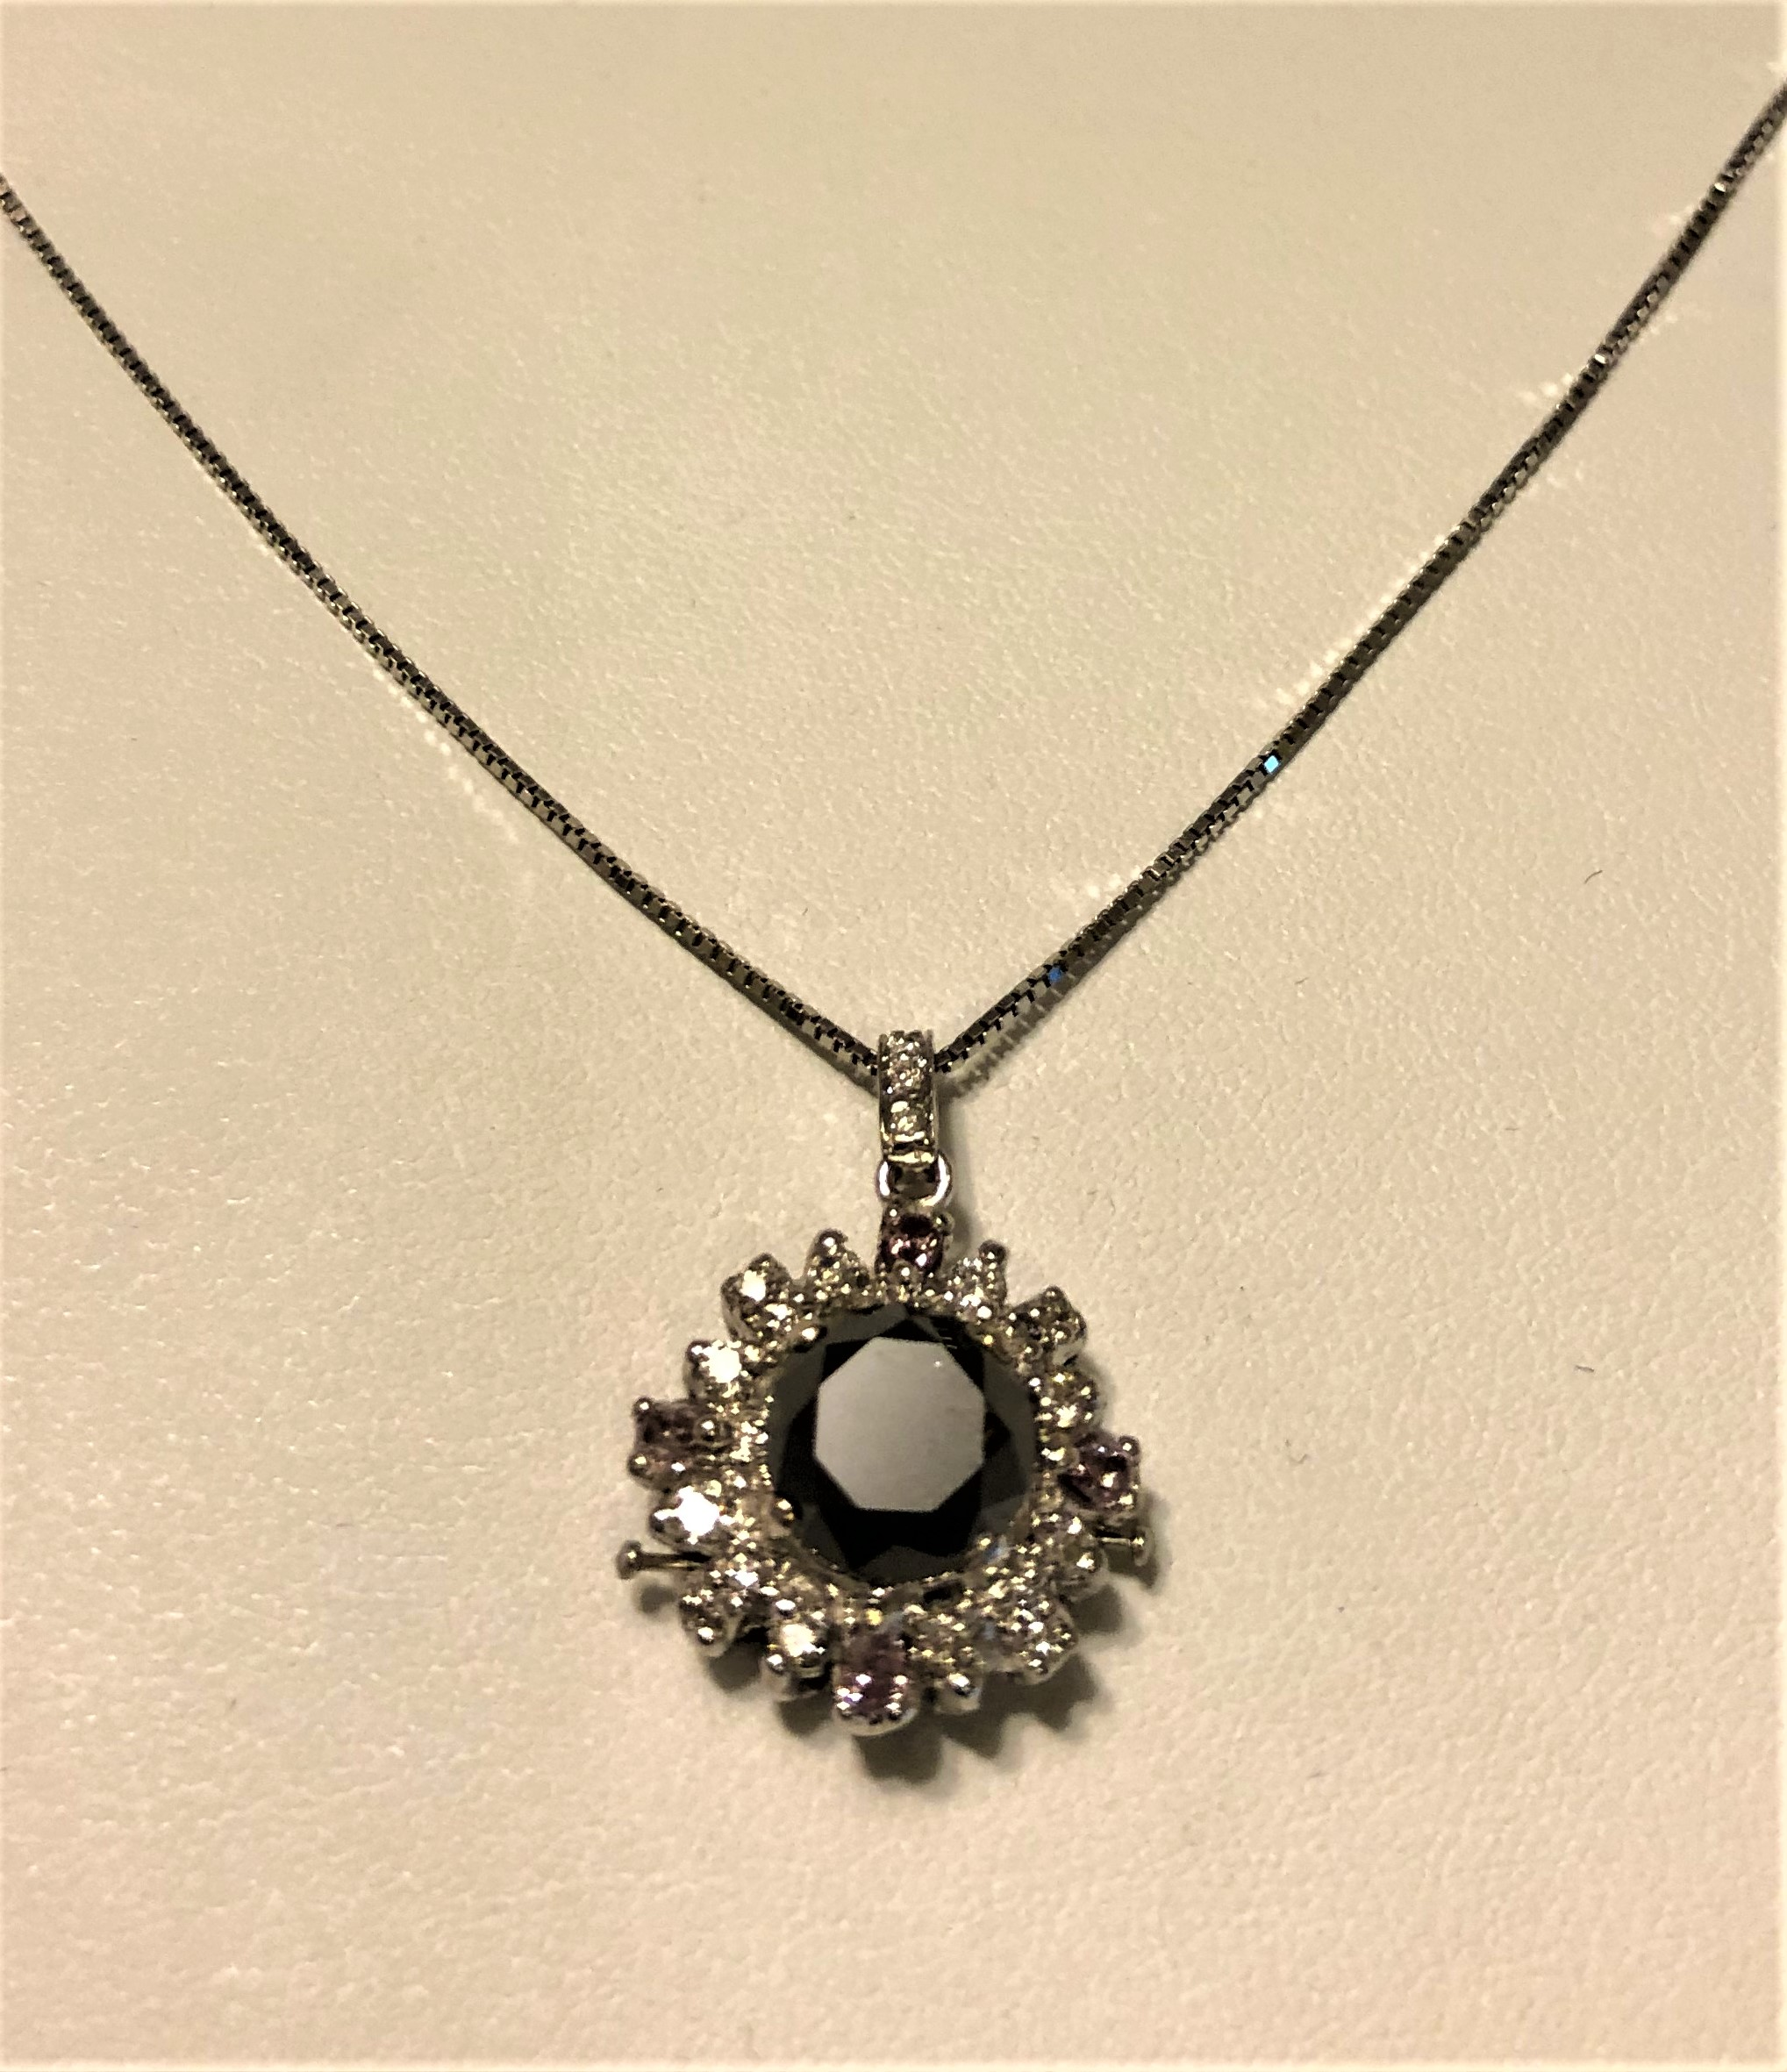 3.44ct Black Diamond Pendant (4.21ct TW estimated)